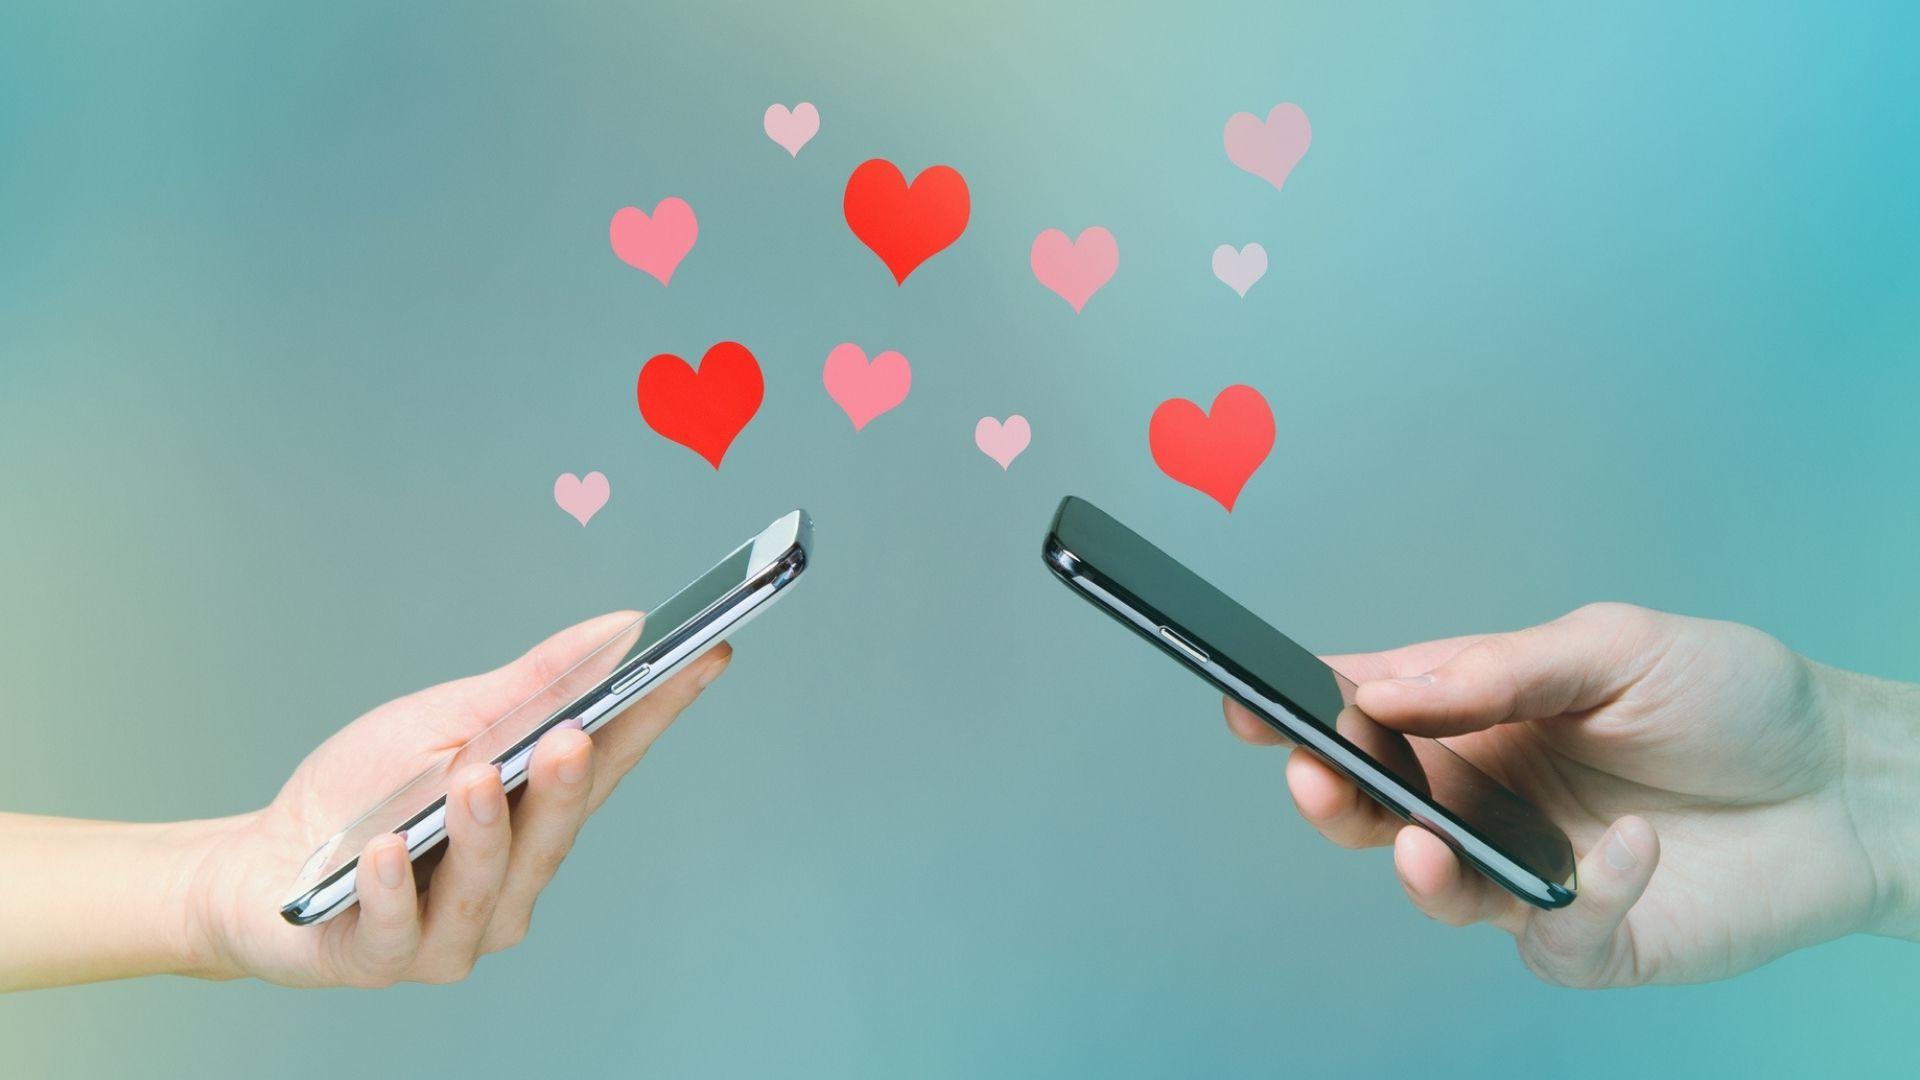 online dating background nong khai dating